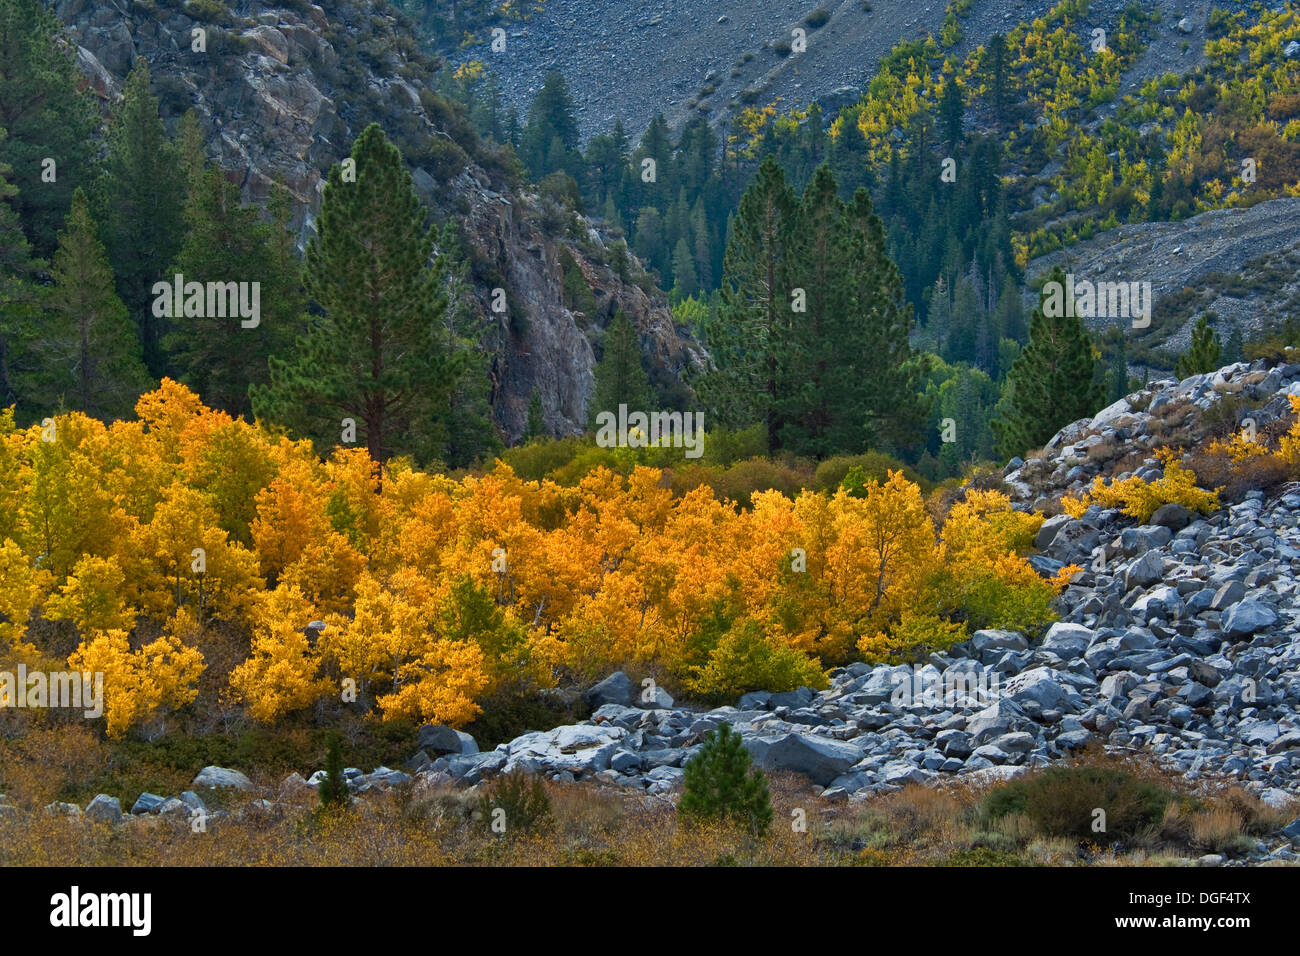 Aspen trees in fall near Tioga Pass, Mono County, California - Stock Image